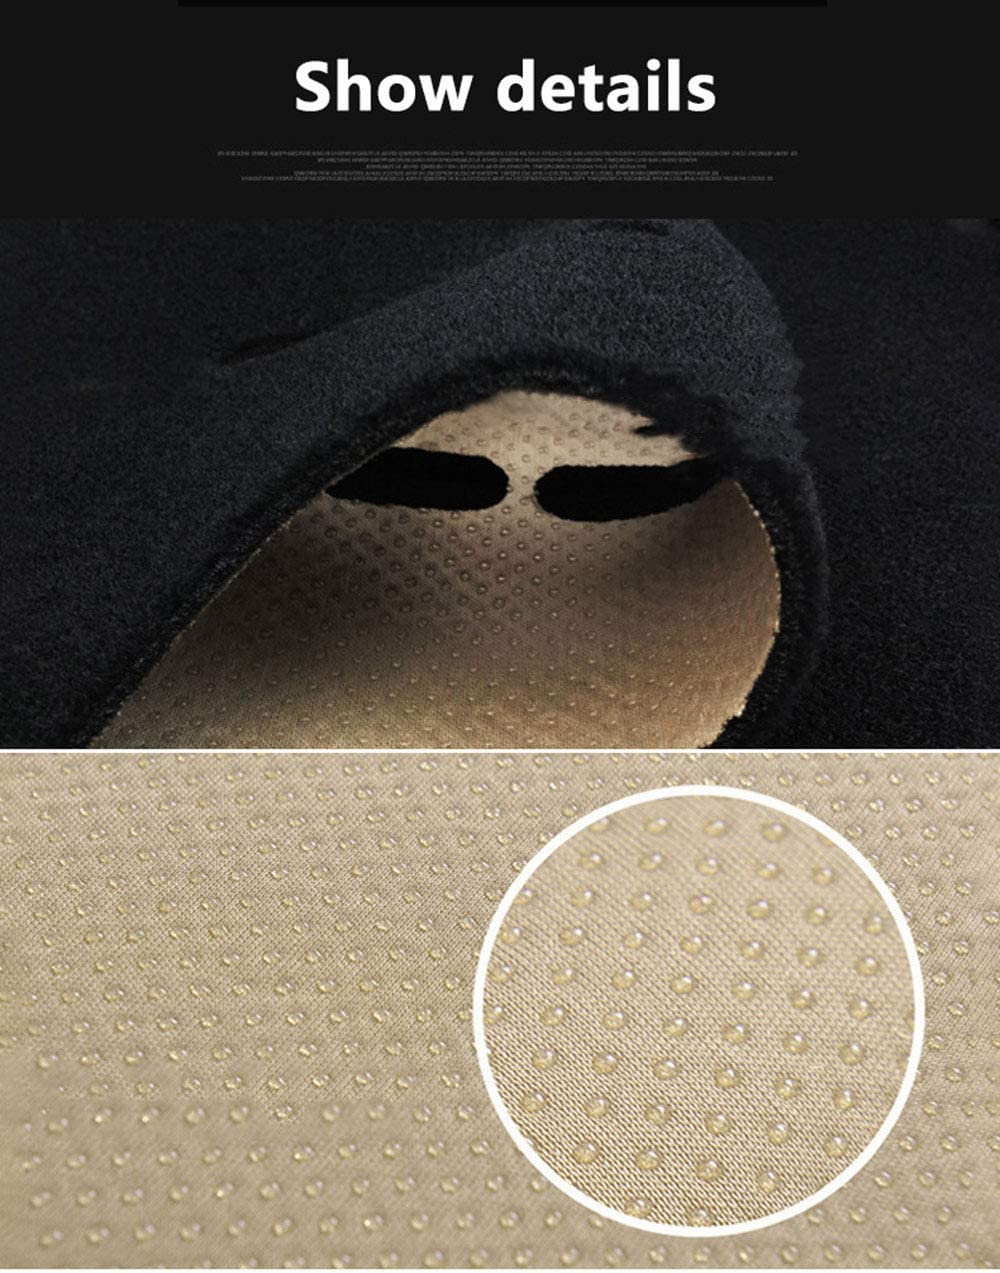 CARLAMPCR Dashboard Black Center Console Cover Dash Mat Protector Sunshield Cover Pad Carpet for Suzuki Vitara 4th,LHDBlueside